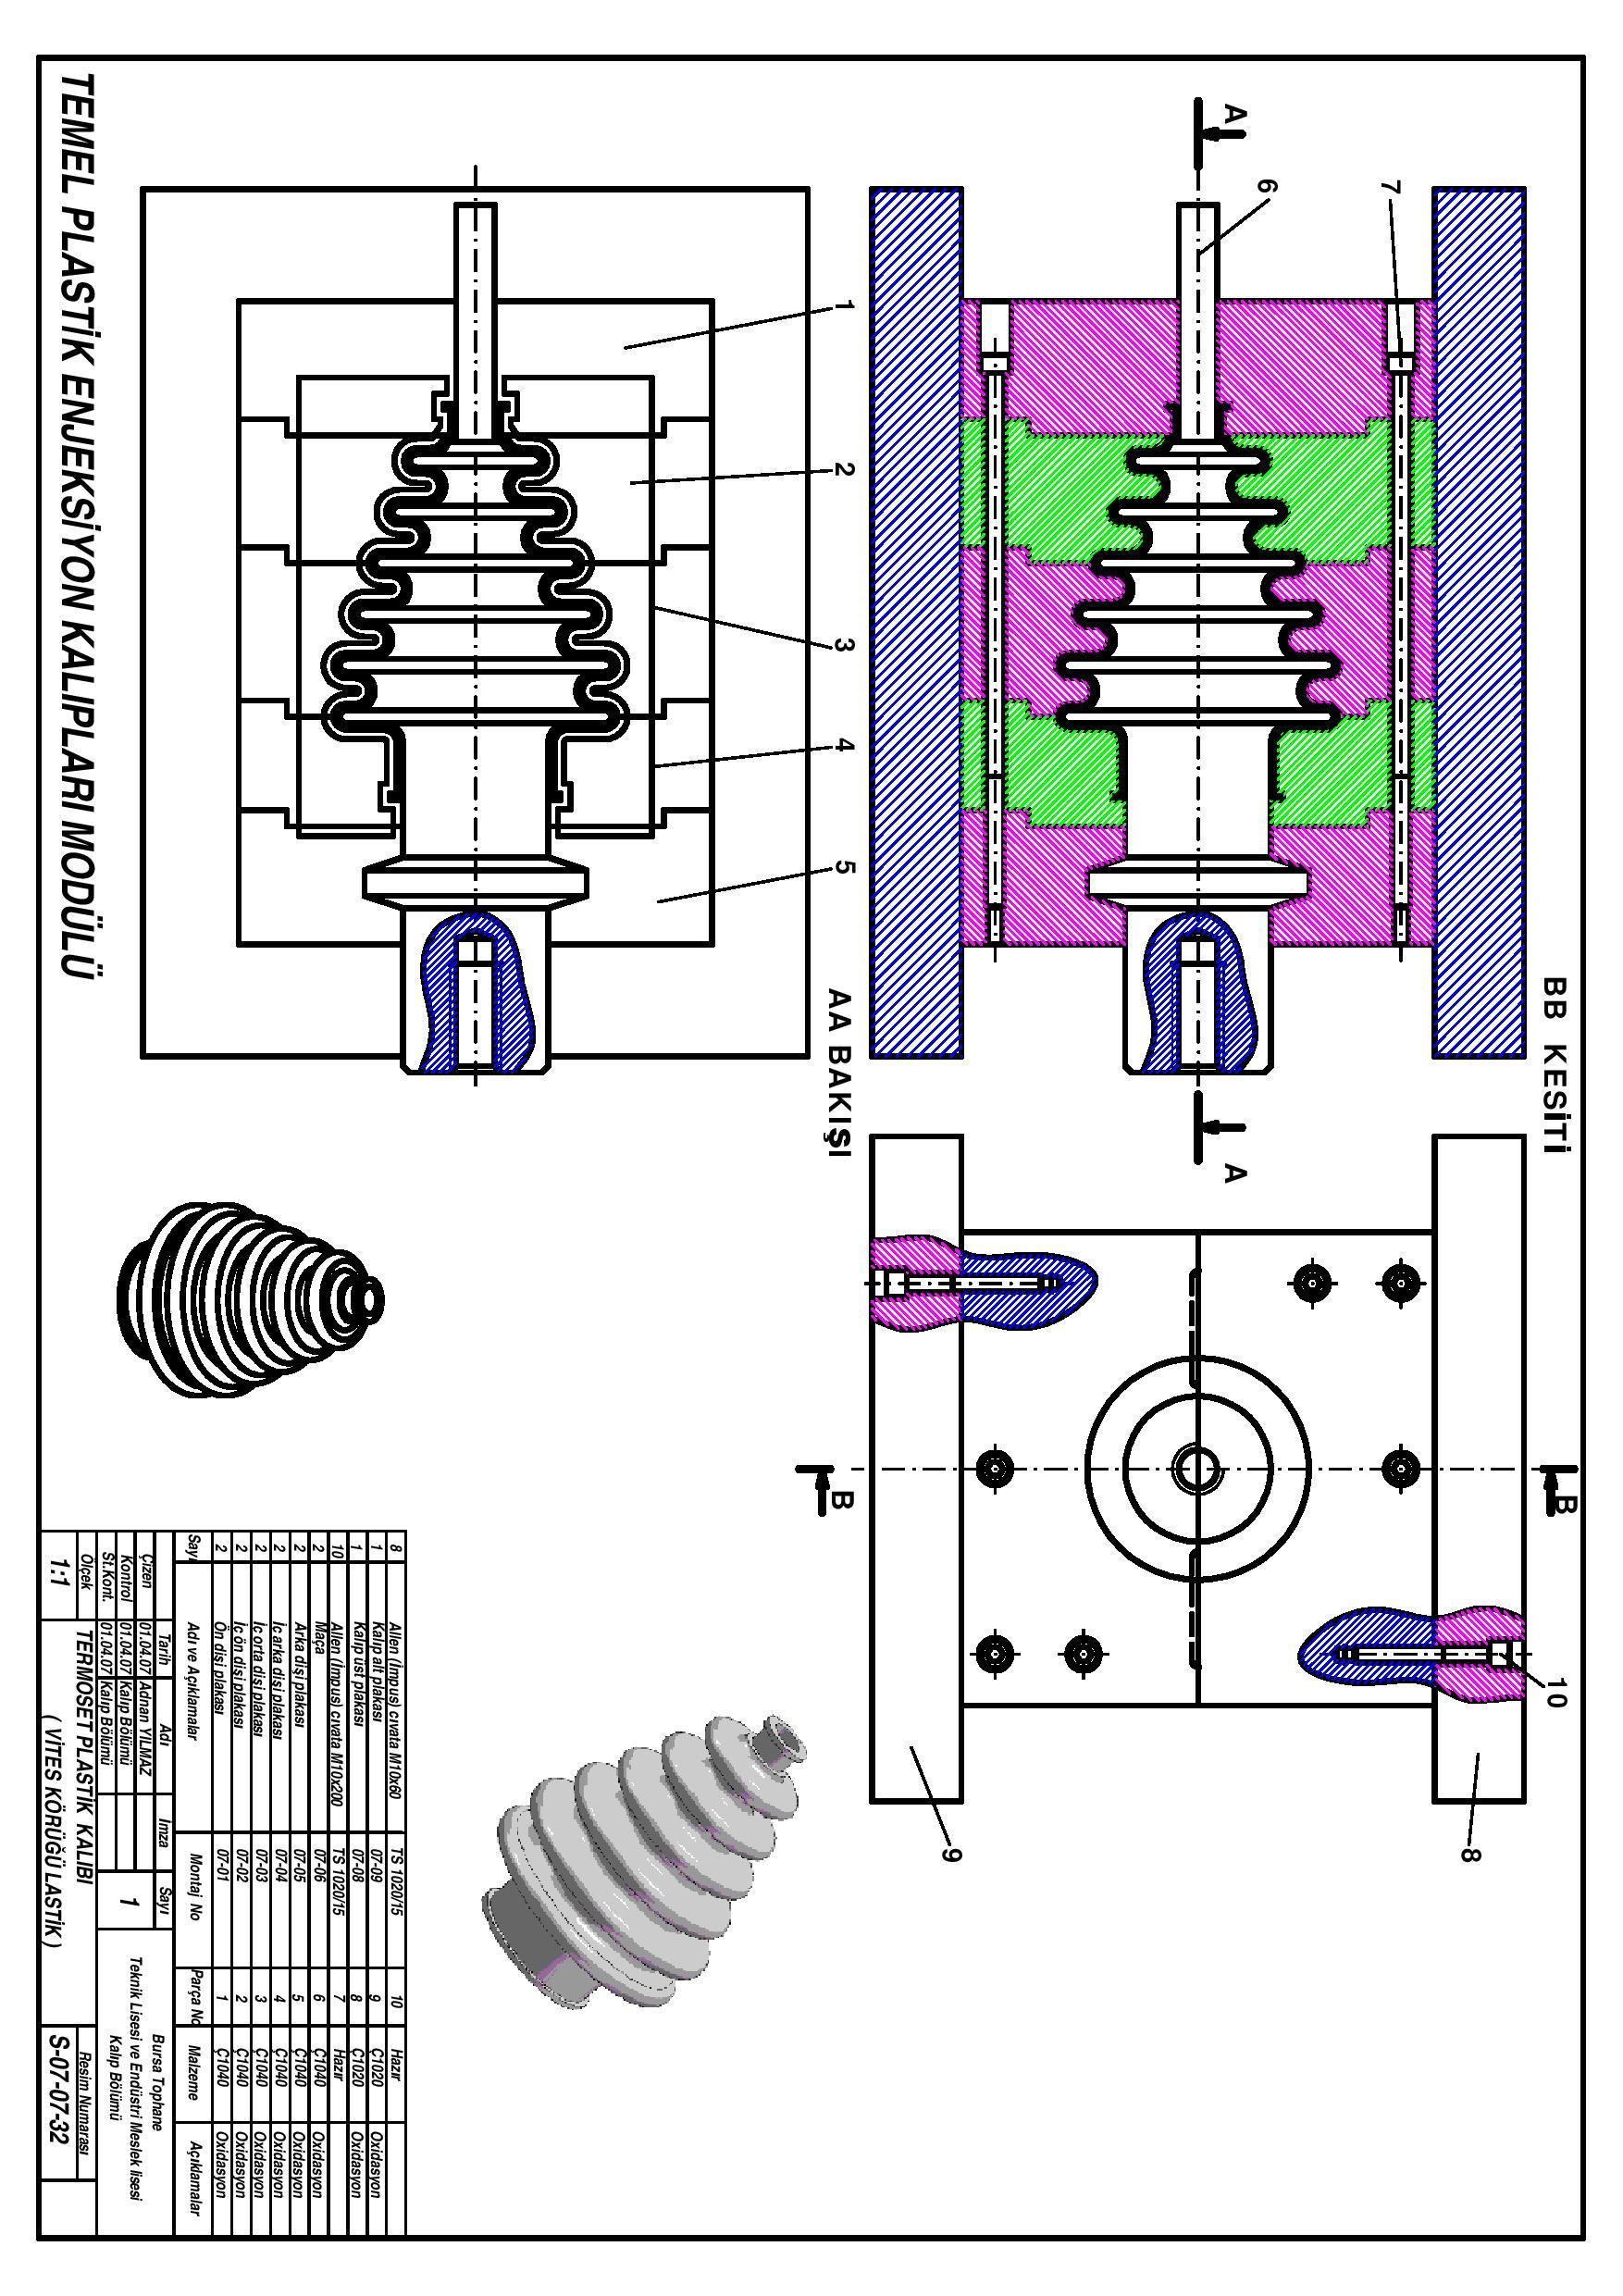 termoset plastik kalıbı (vites körüğü lastik)